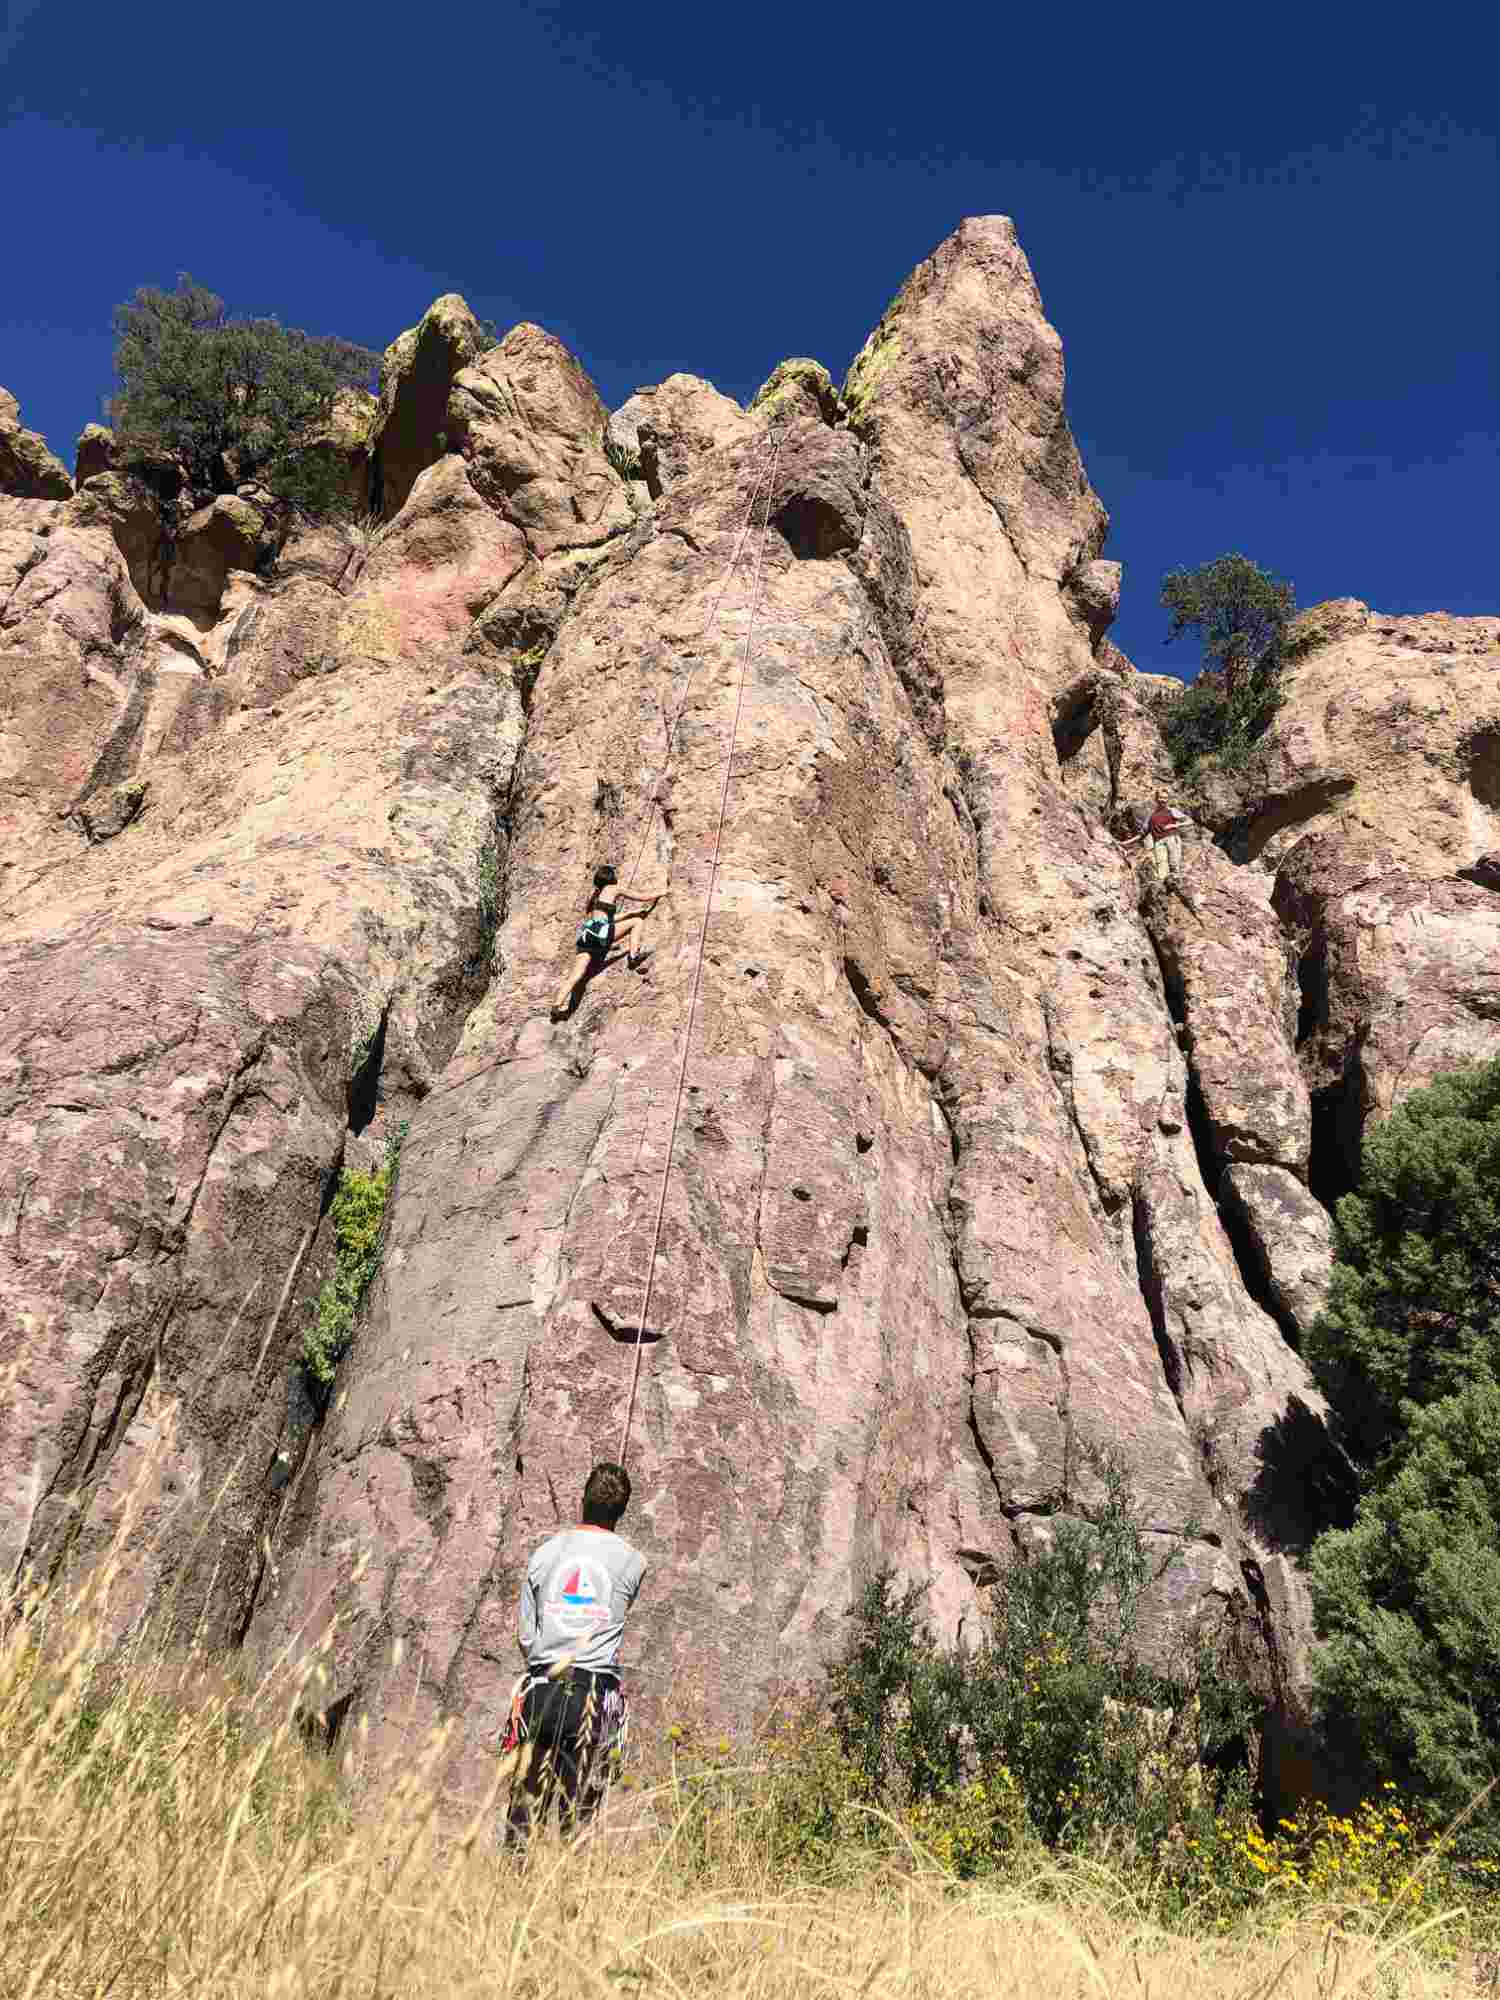 Climbing Moonstruck on top rope at Luna Park